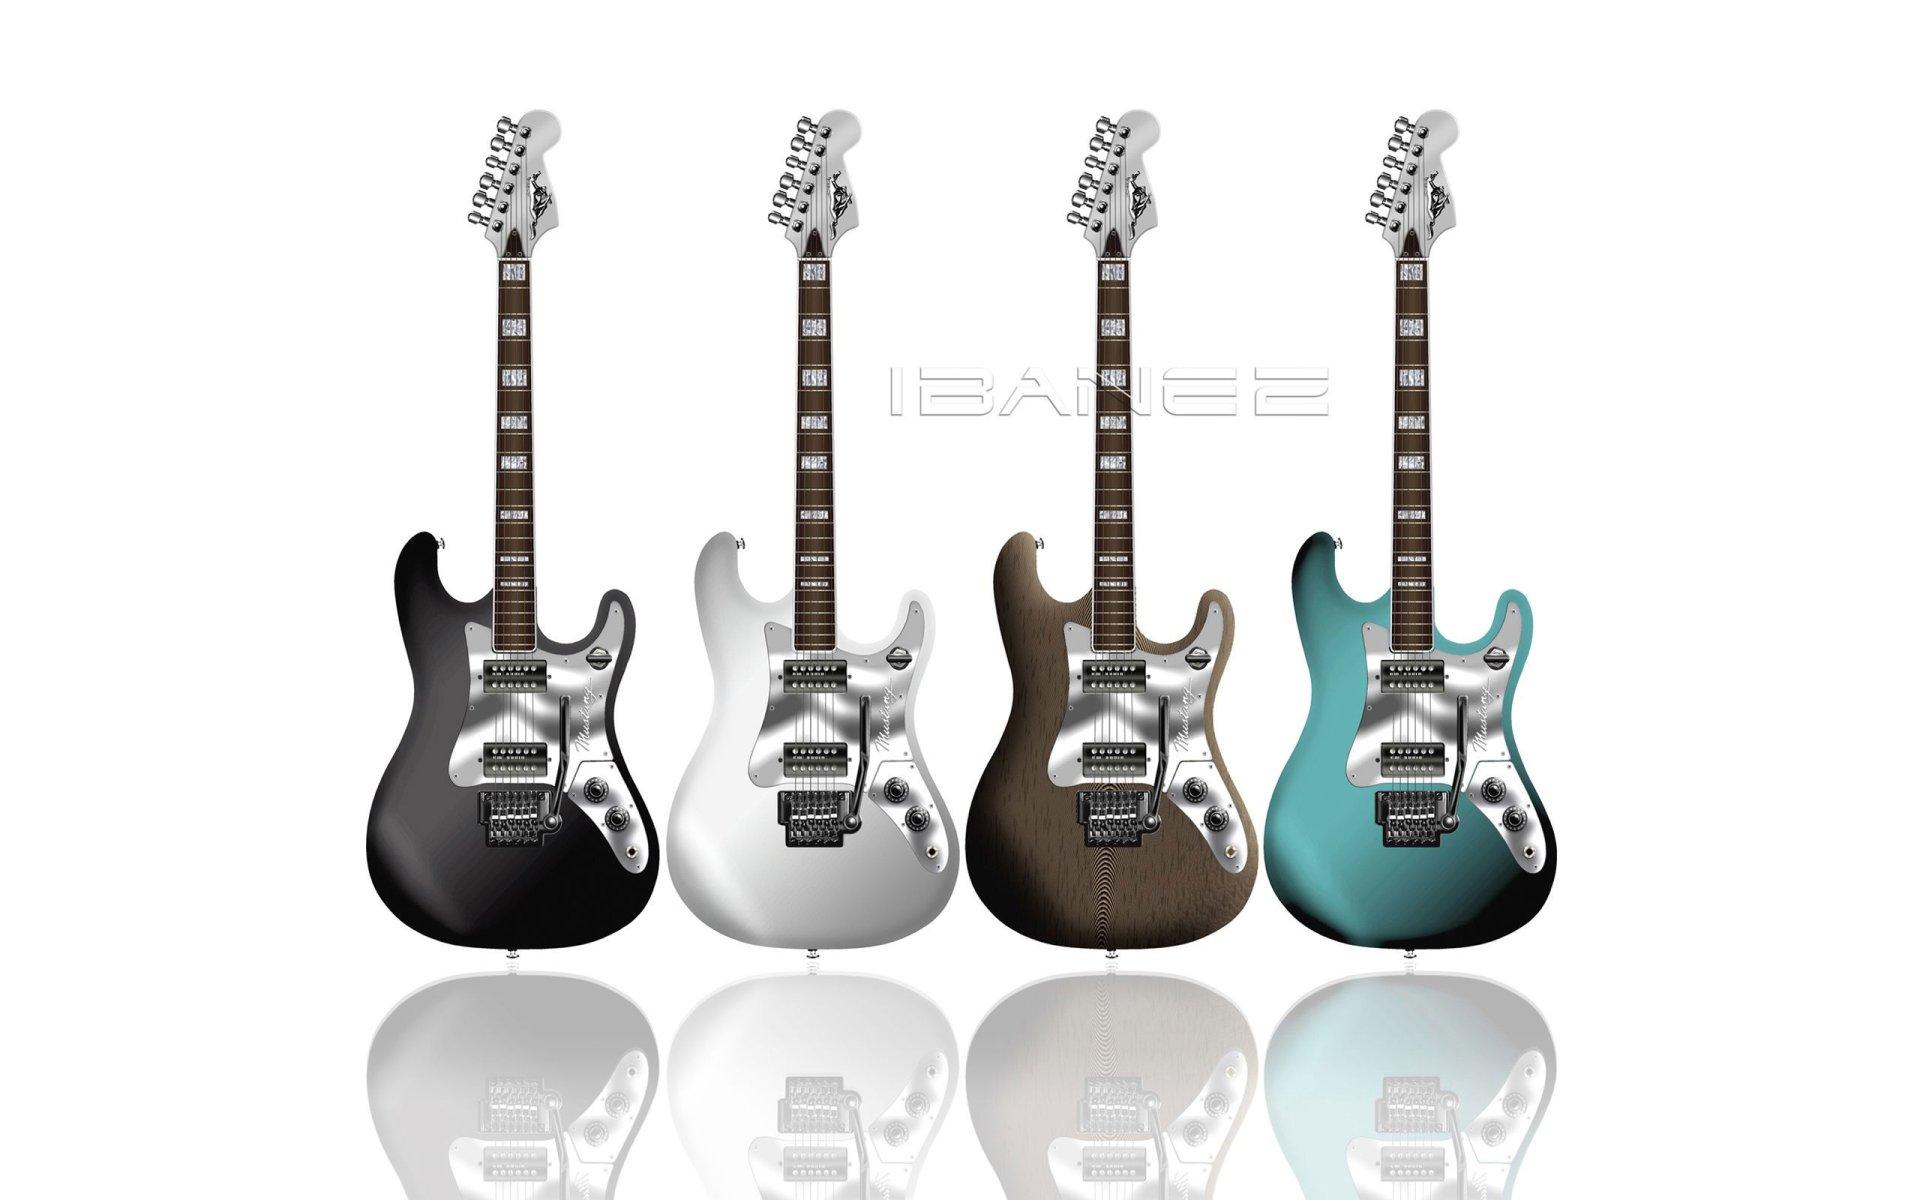 Ibanez Guitar Wallpaper: IBANEZ HD Wallpaper